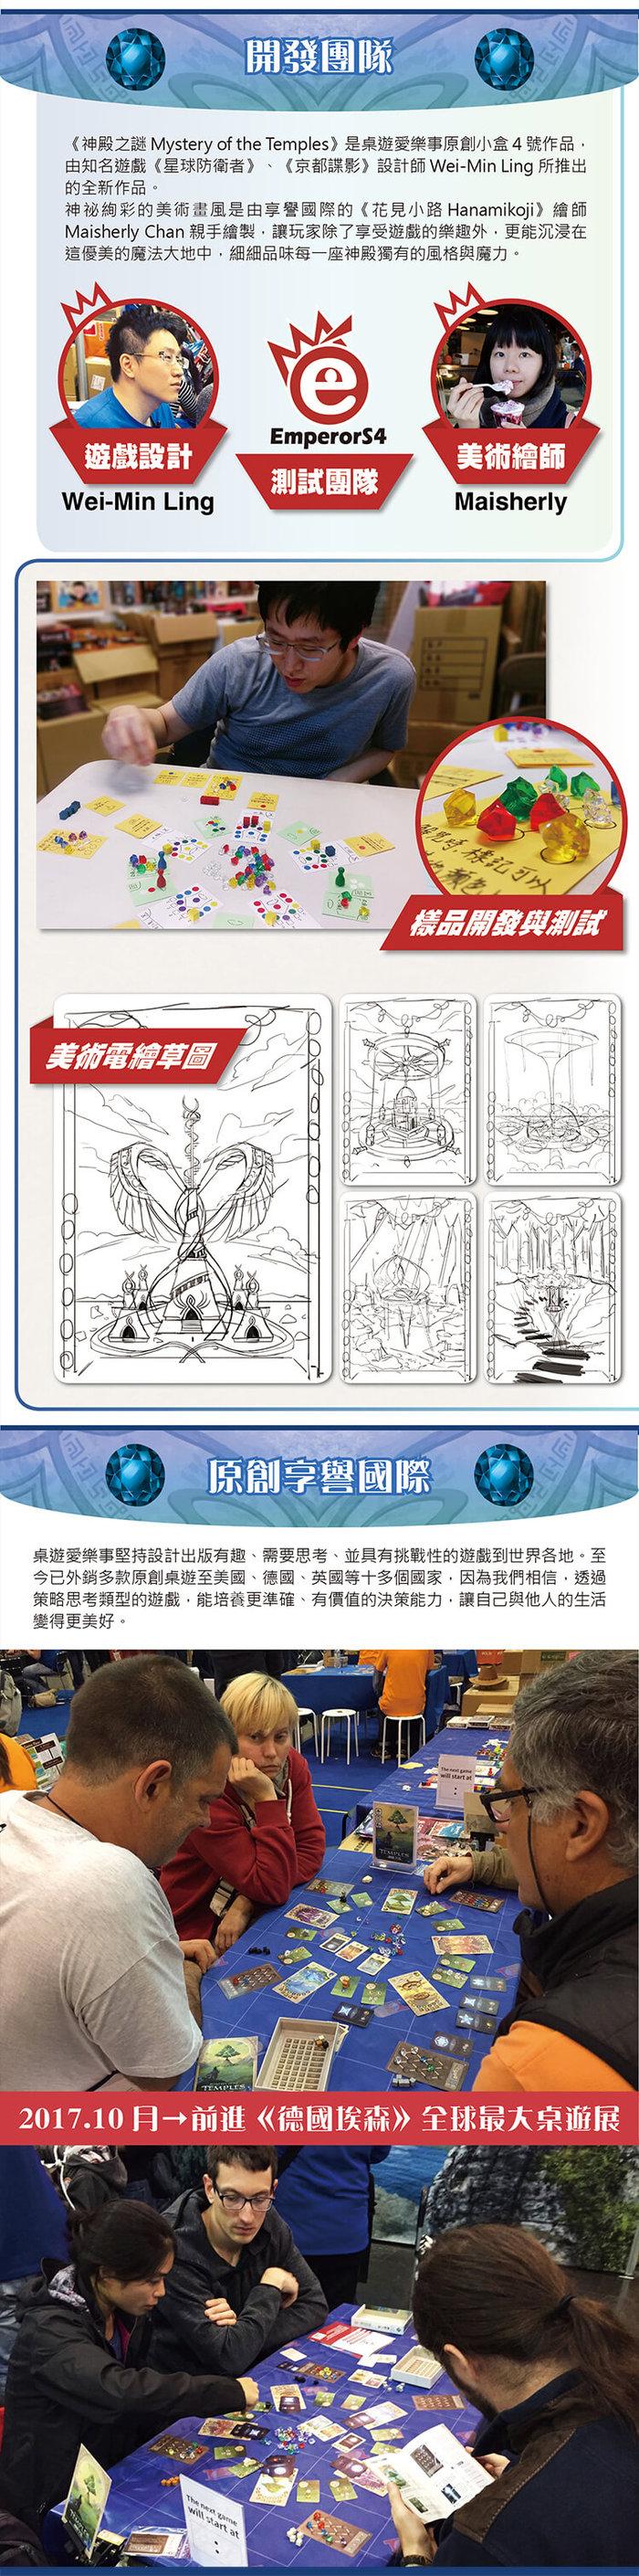 桌遊愛樂事 EmperorS4|神殿之謎